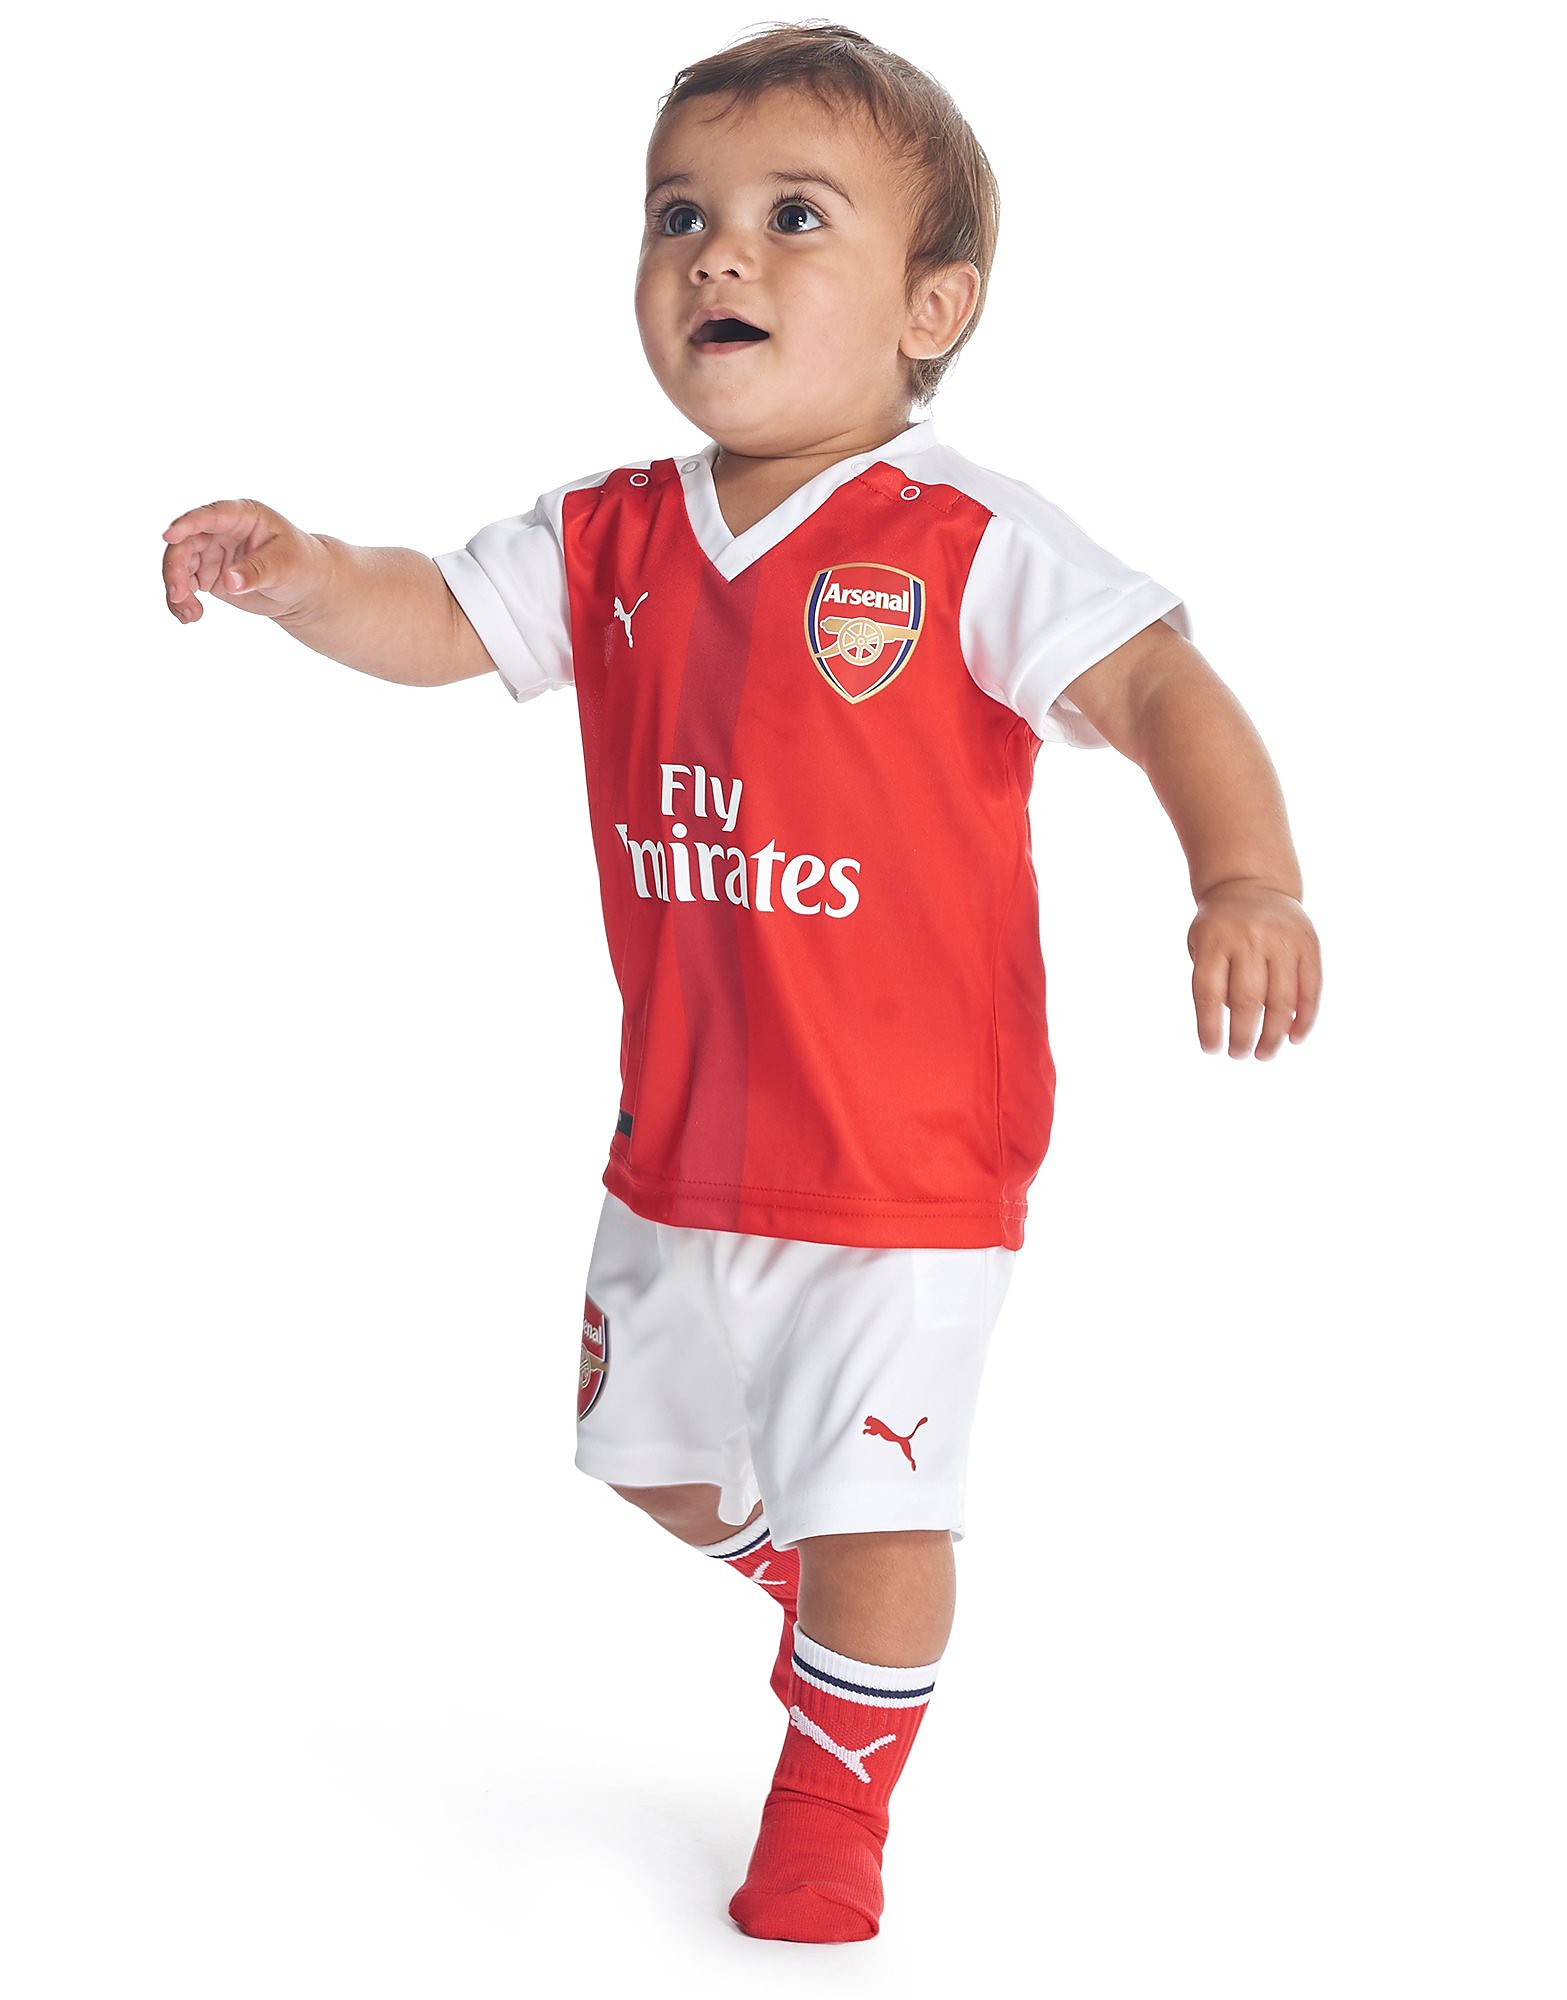 PUMA Arsenal FC 2016/17 Home Kit Infant